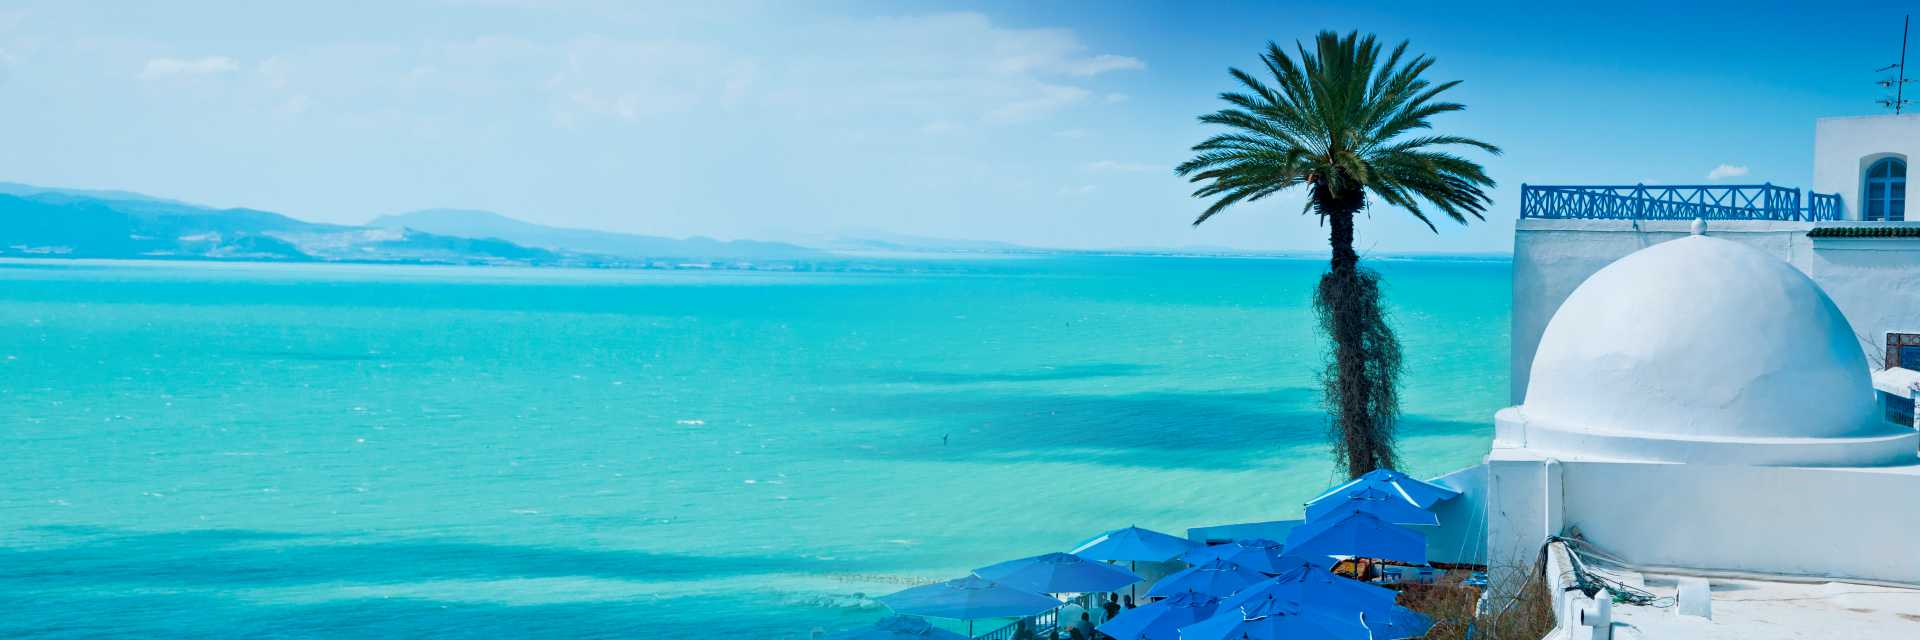 ewakacje - Maroko last minute